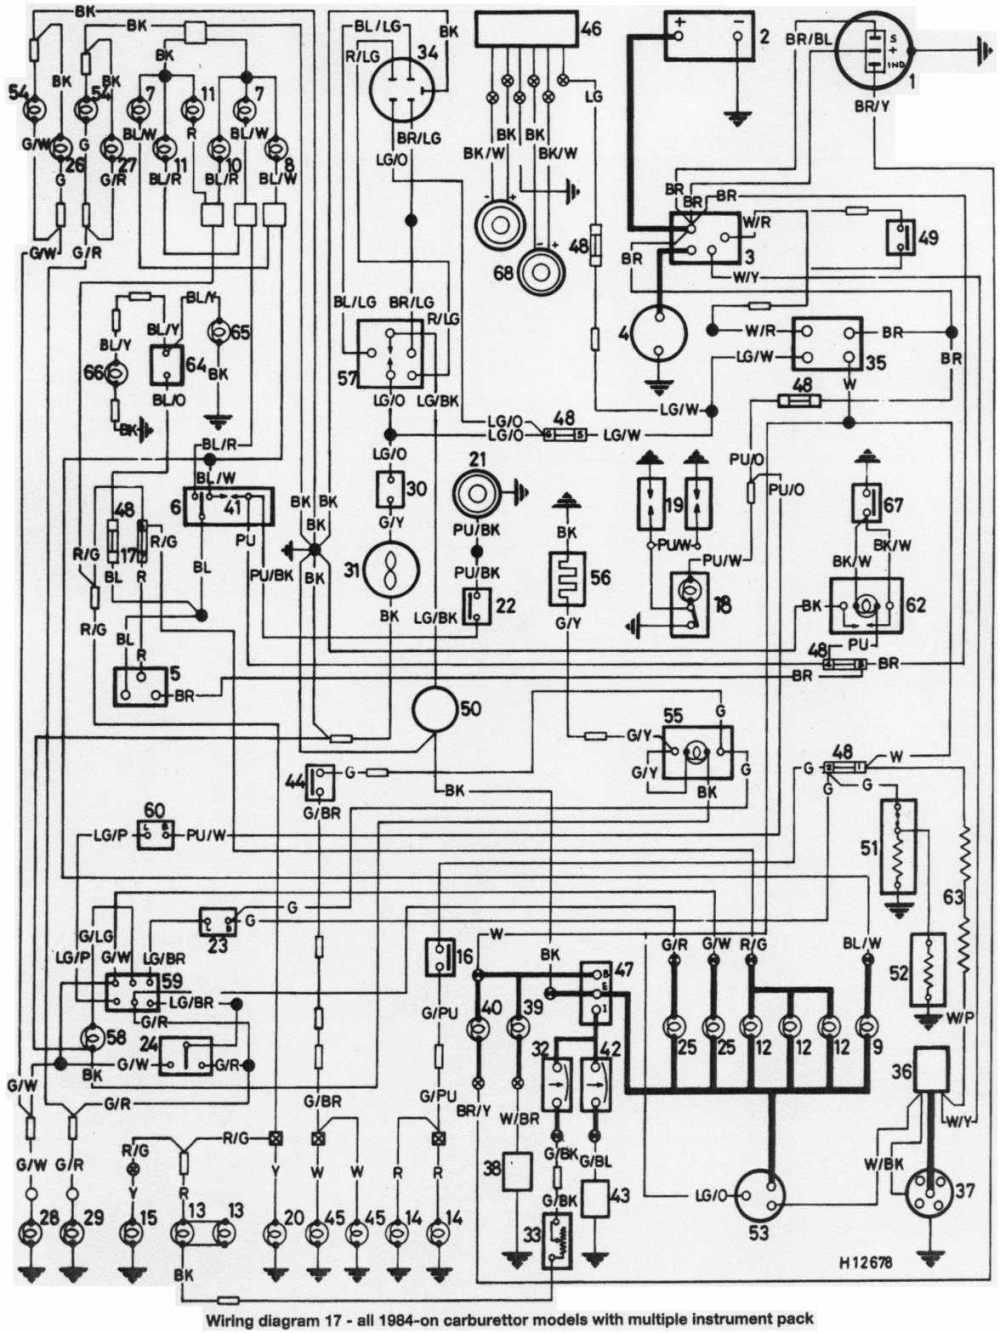 medium resolution of austin healey sprite wiring diagram 35 wiring diagram images austin healey sprite body austin healey frogeye